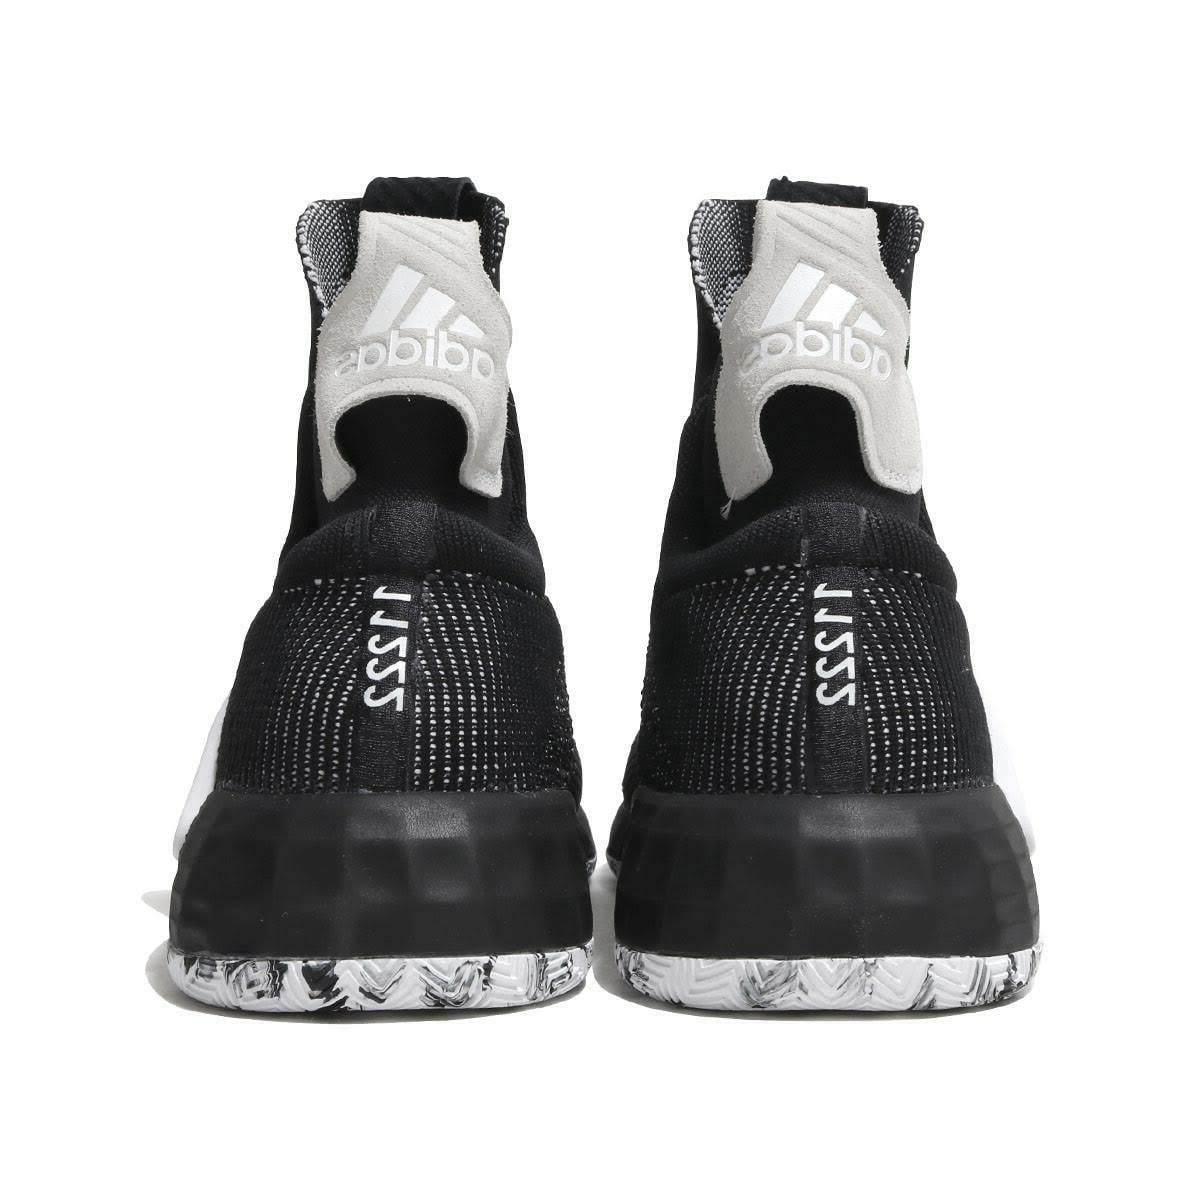 Adidas Laceless Trae Young Lavine